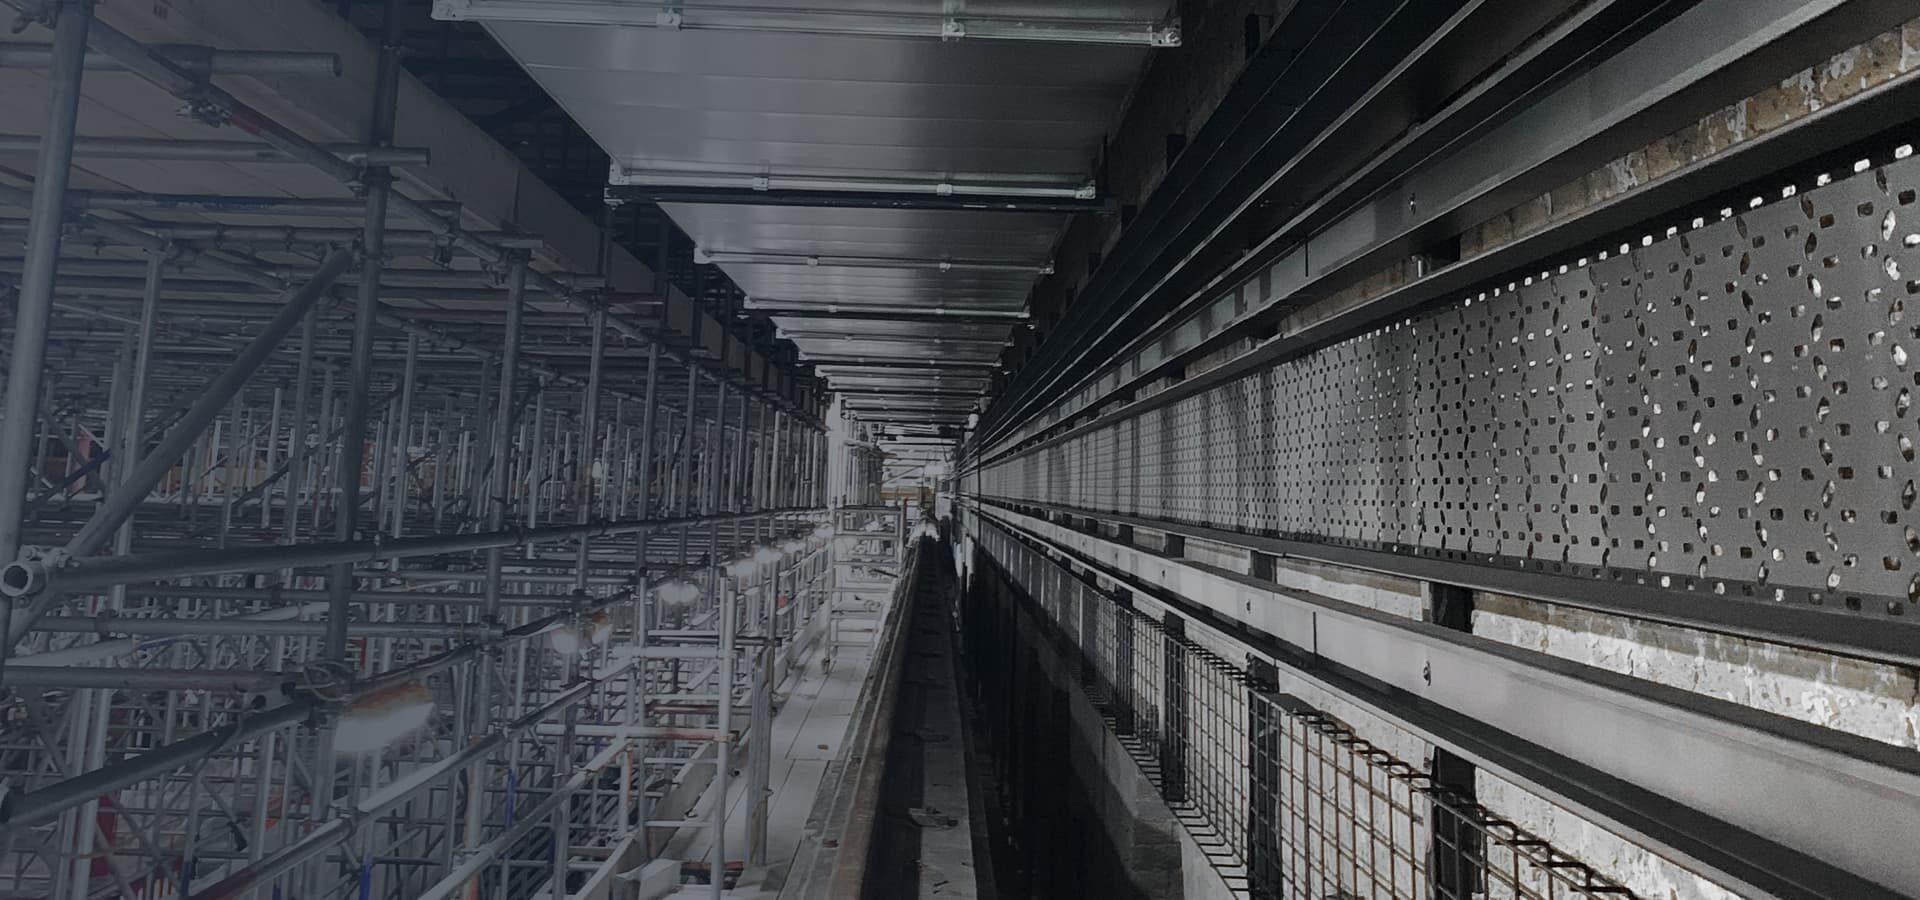 Specialist ventilation ductwork contractor